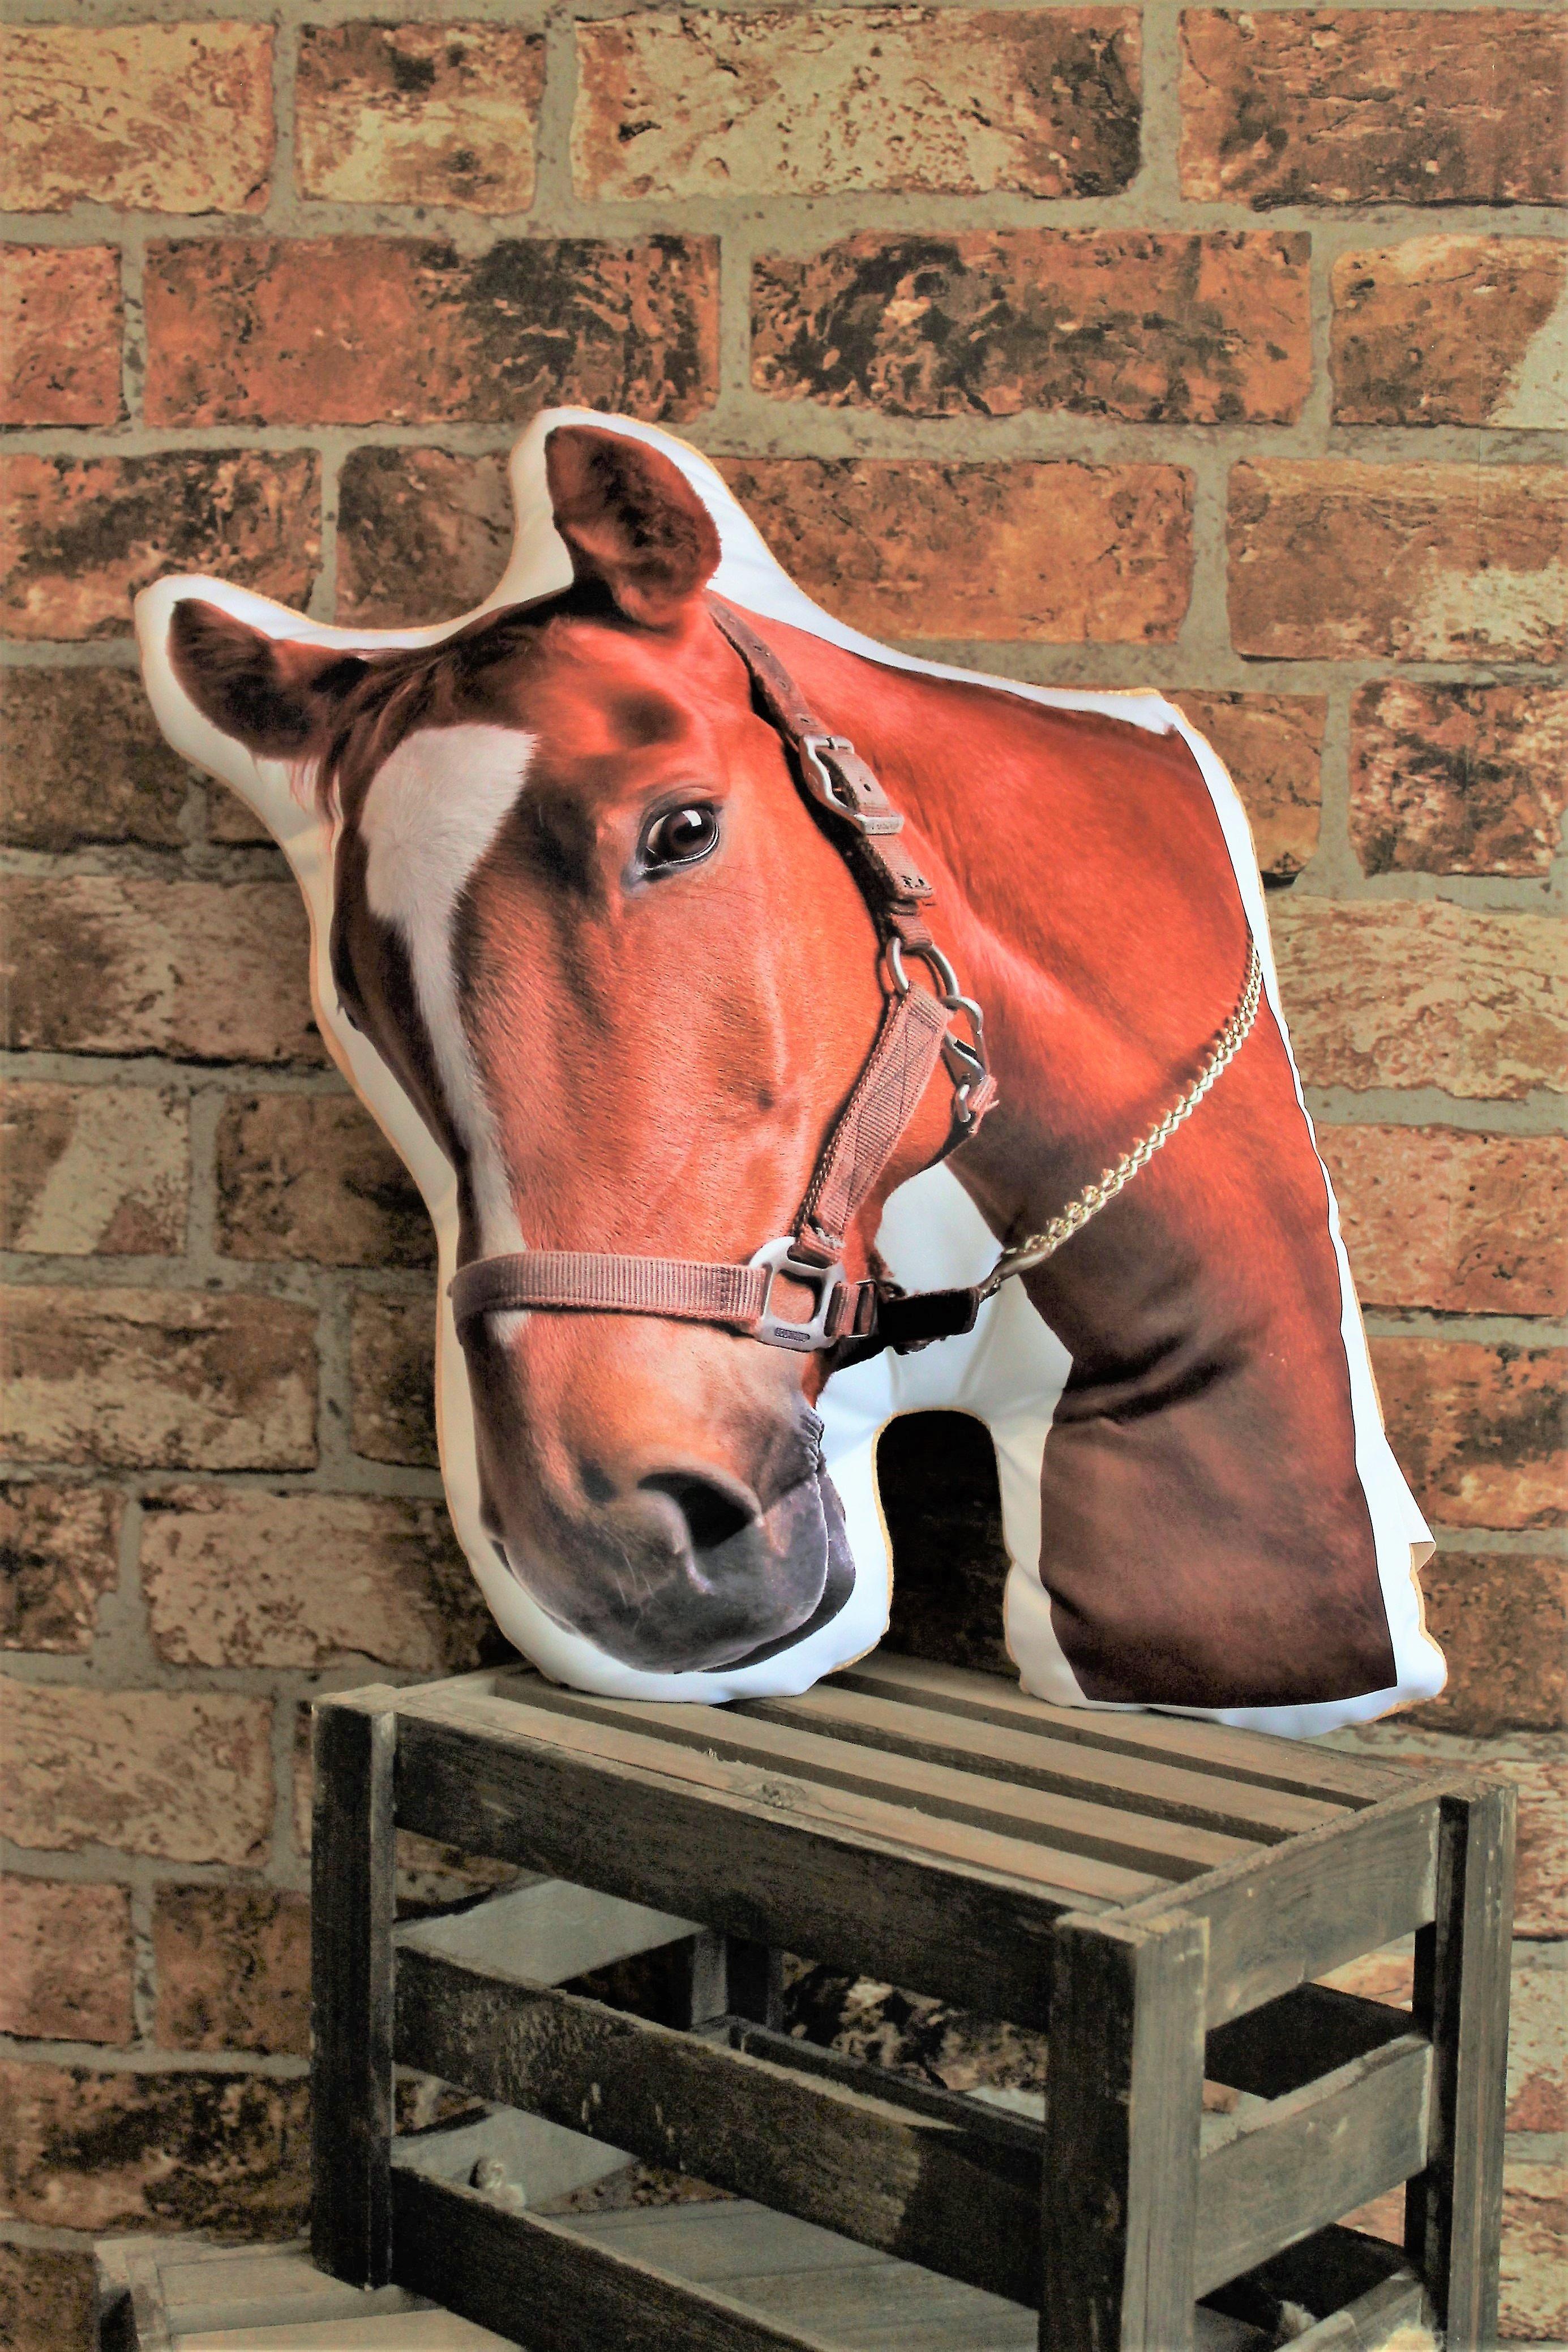 Adorable chestnut horse shaped cushion